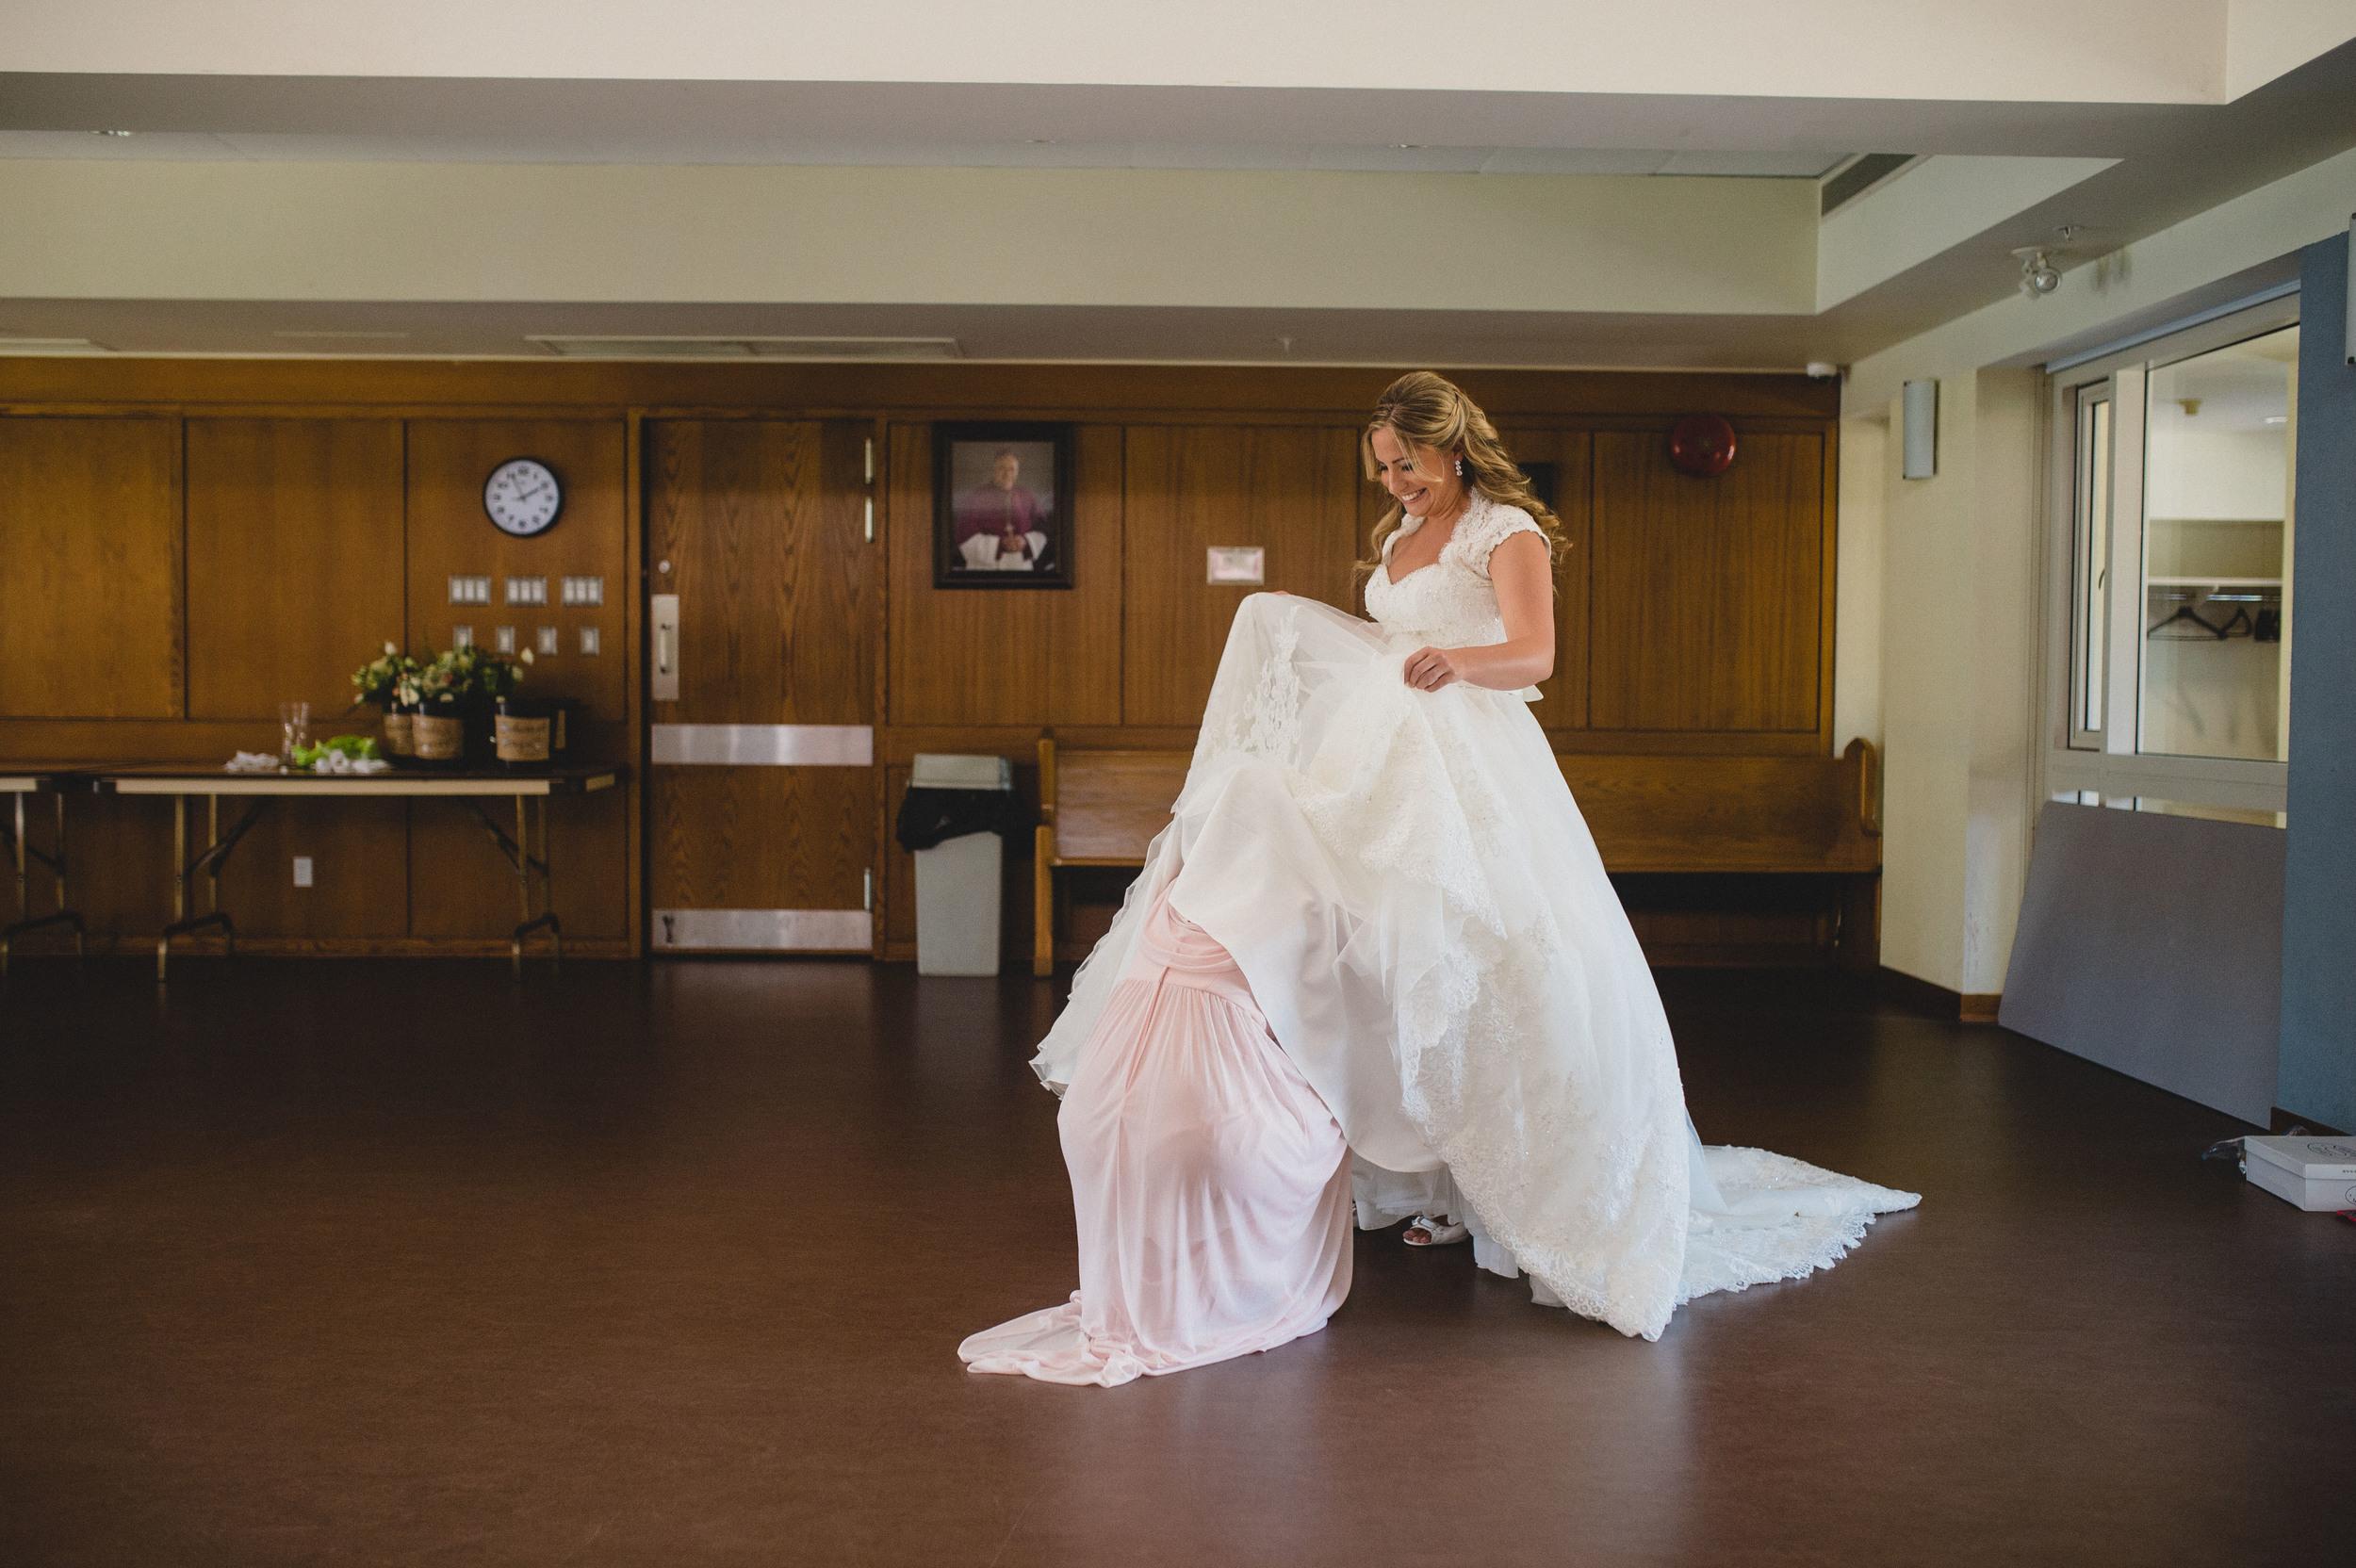 Vancouver St Augustine 's Church wedding photographer edward lai photography-25.jpg